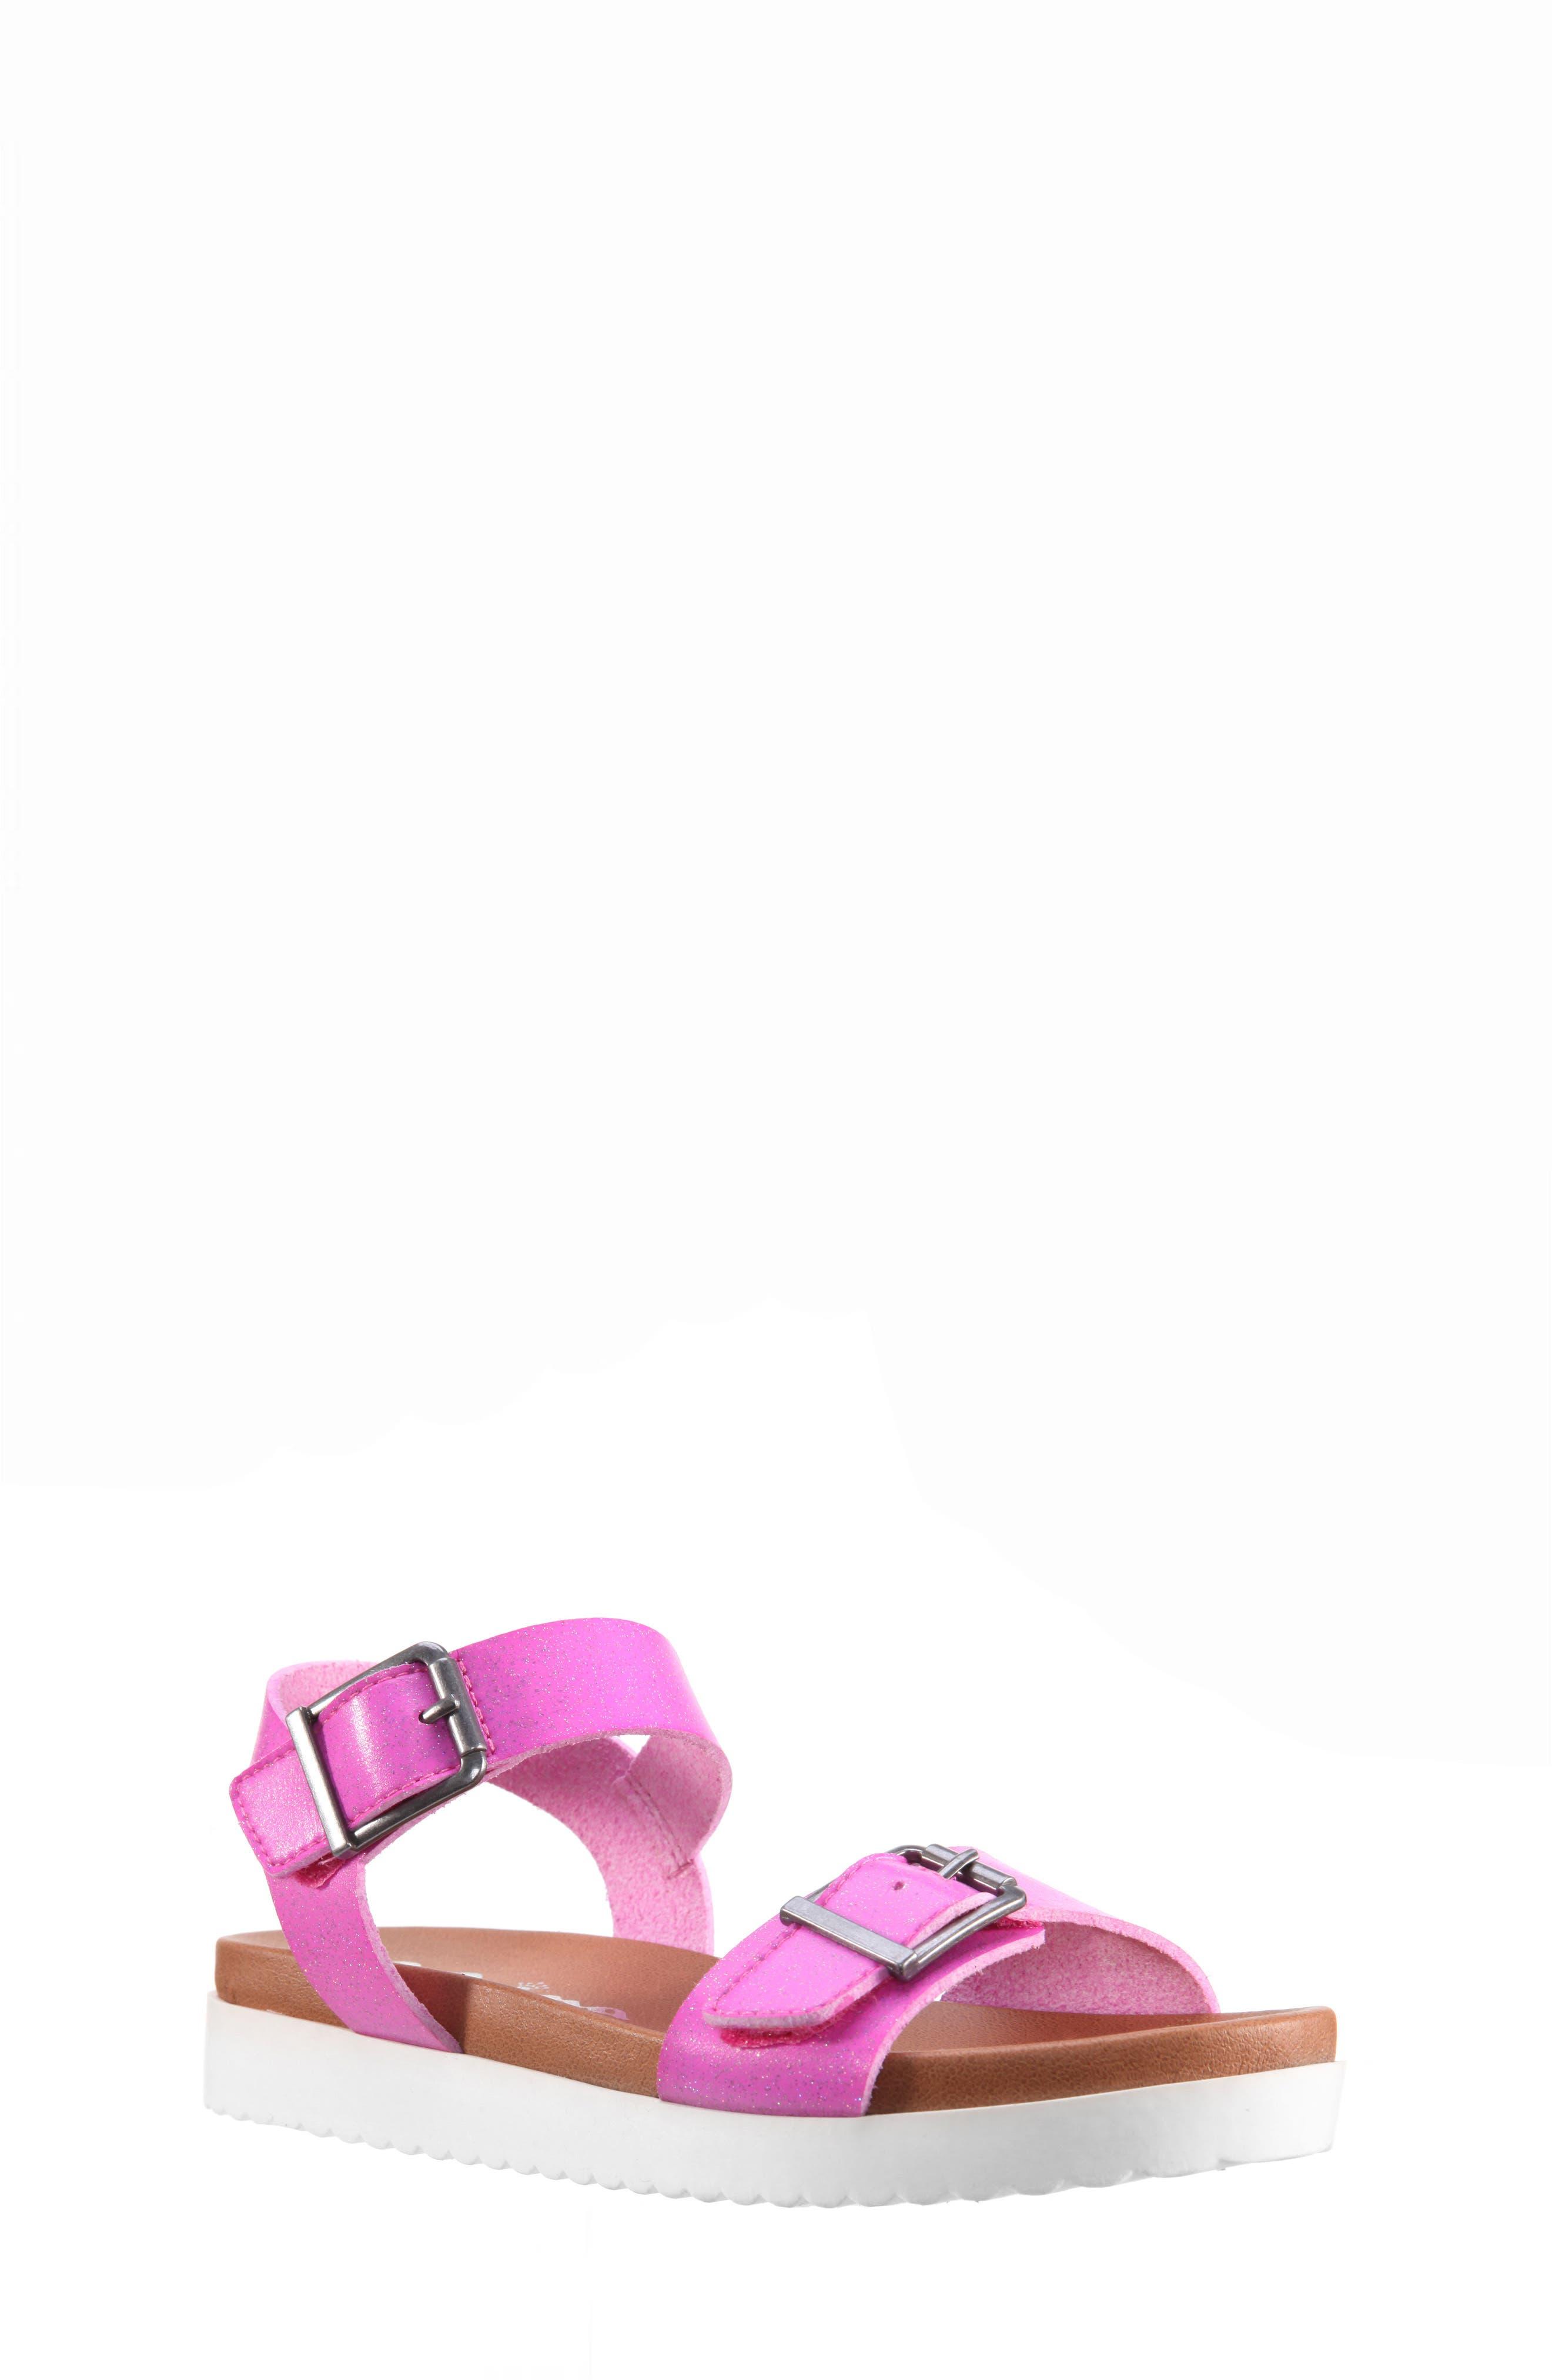 Jacklin3 Quarter Strap Sandal,                         Main,                         color, Pink Dip Dye